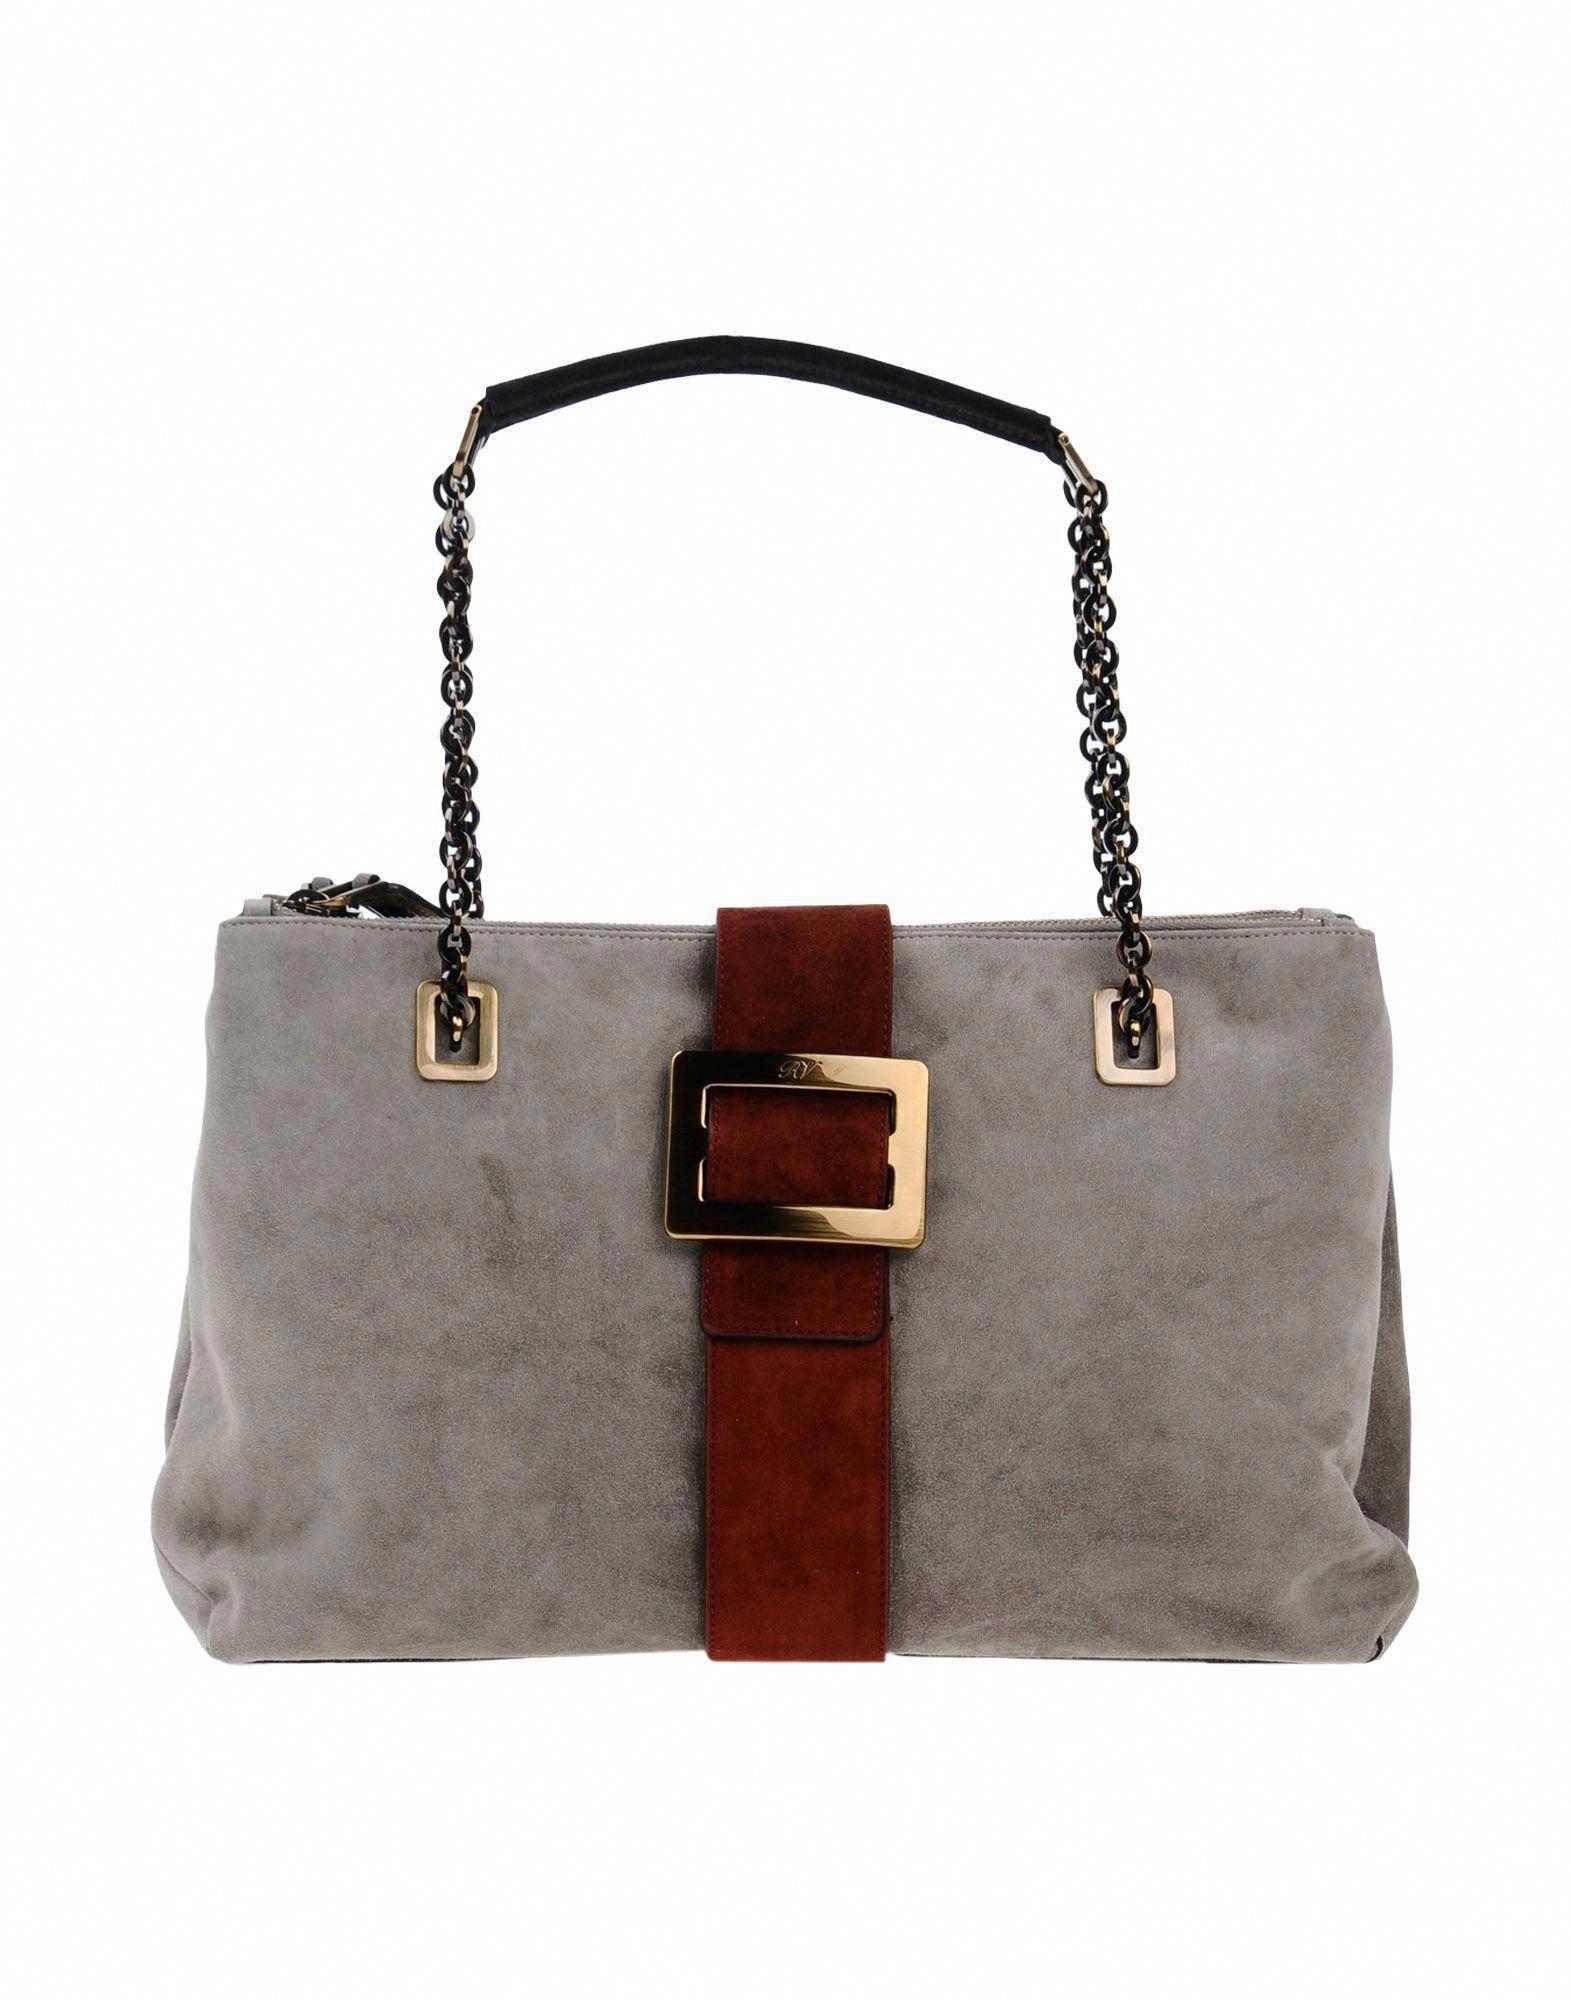 43378555e486 ROGER VIVIER Mini Viv  Crossbody Bag In Leather.  rogervivier  bags  shoulder  bags  hand bags  leather  crossbody